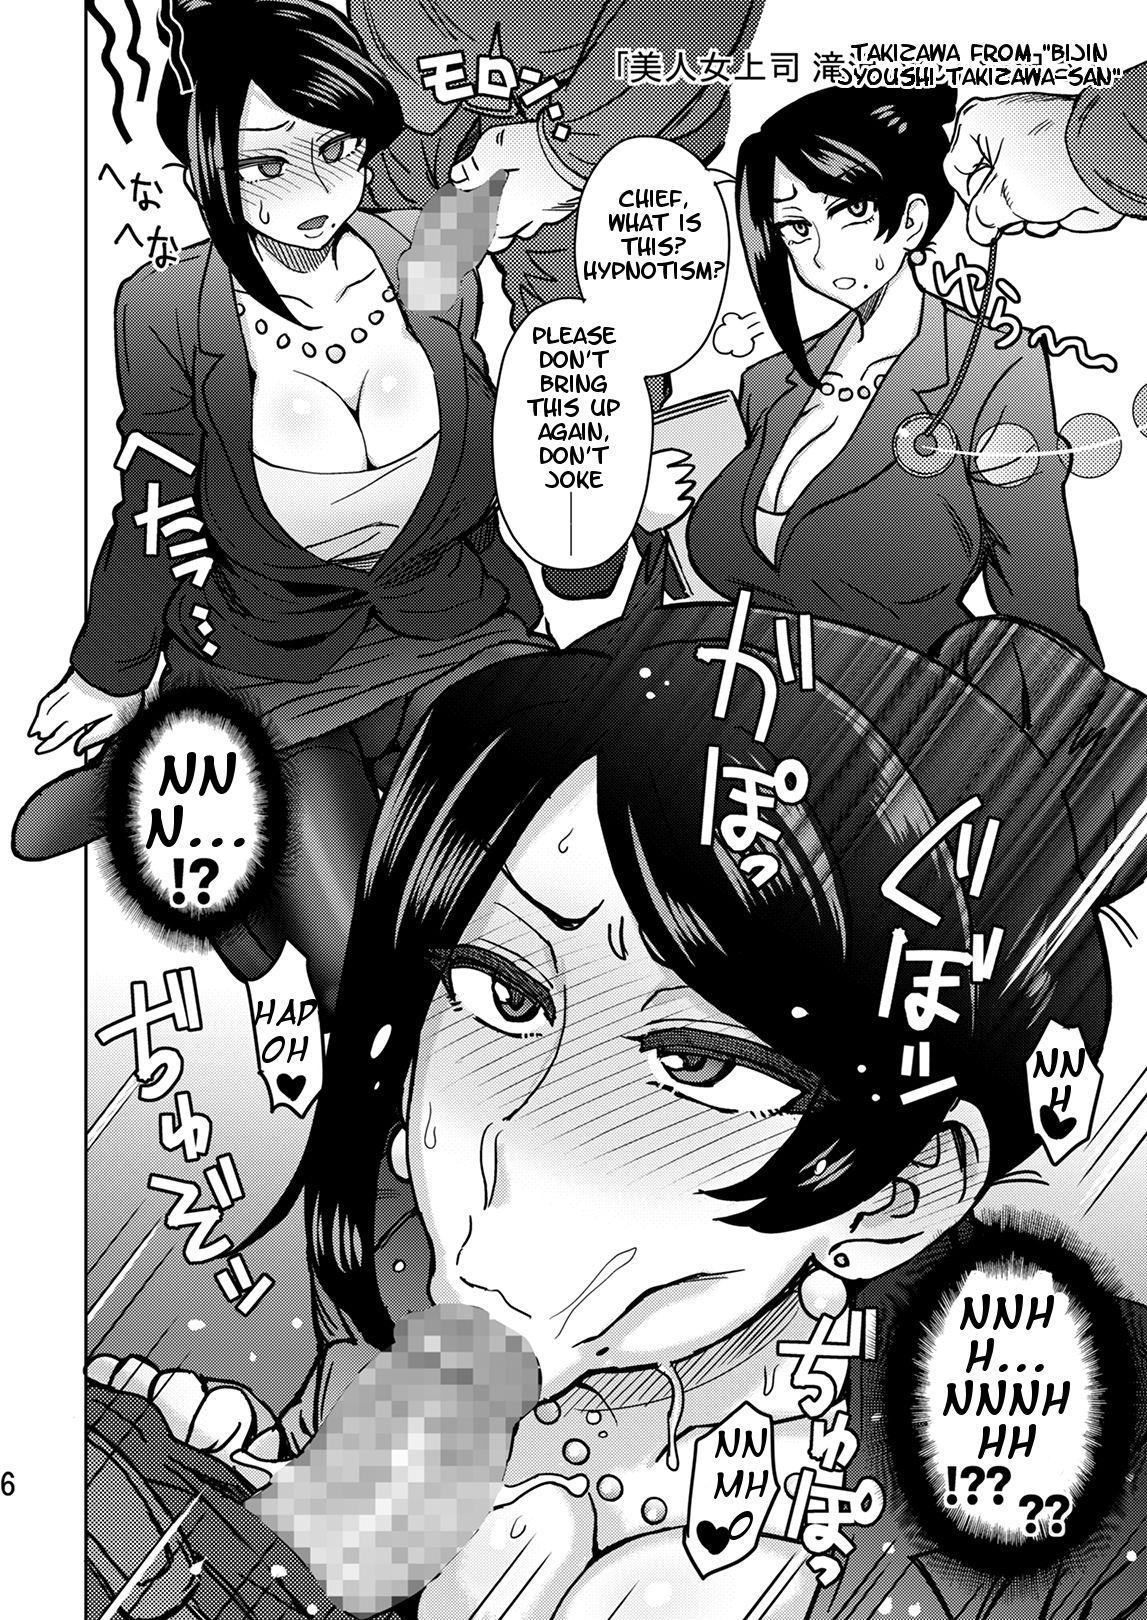 C95 Yorozu NTR Short Manga Shuu | C95 Collection of Various NTR Shorts 6